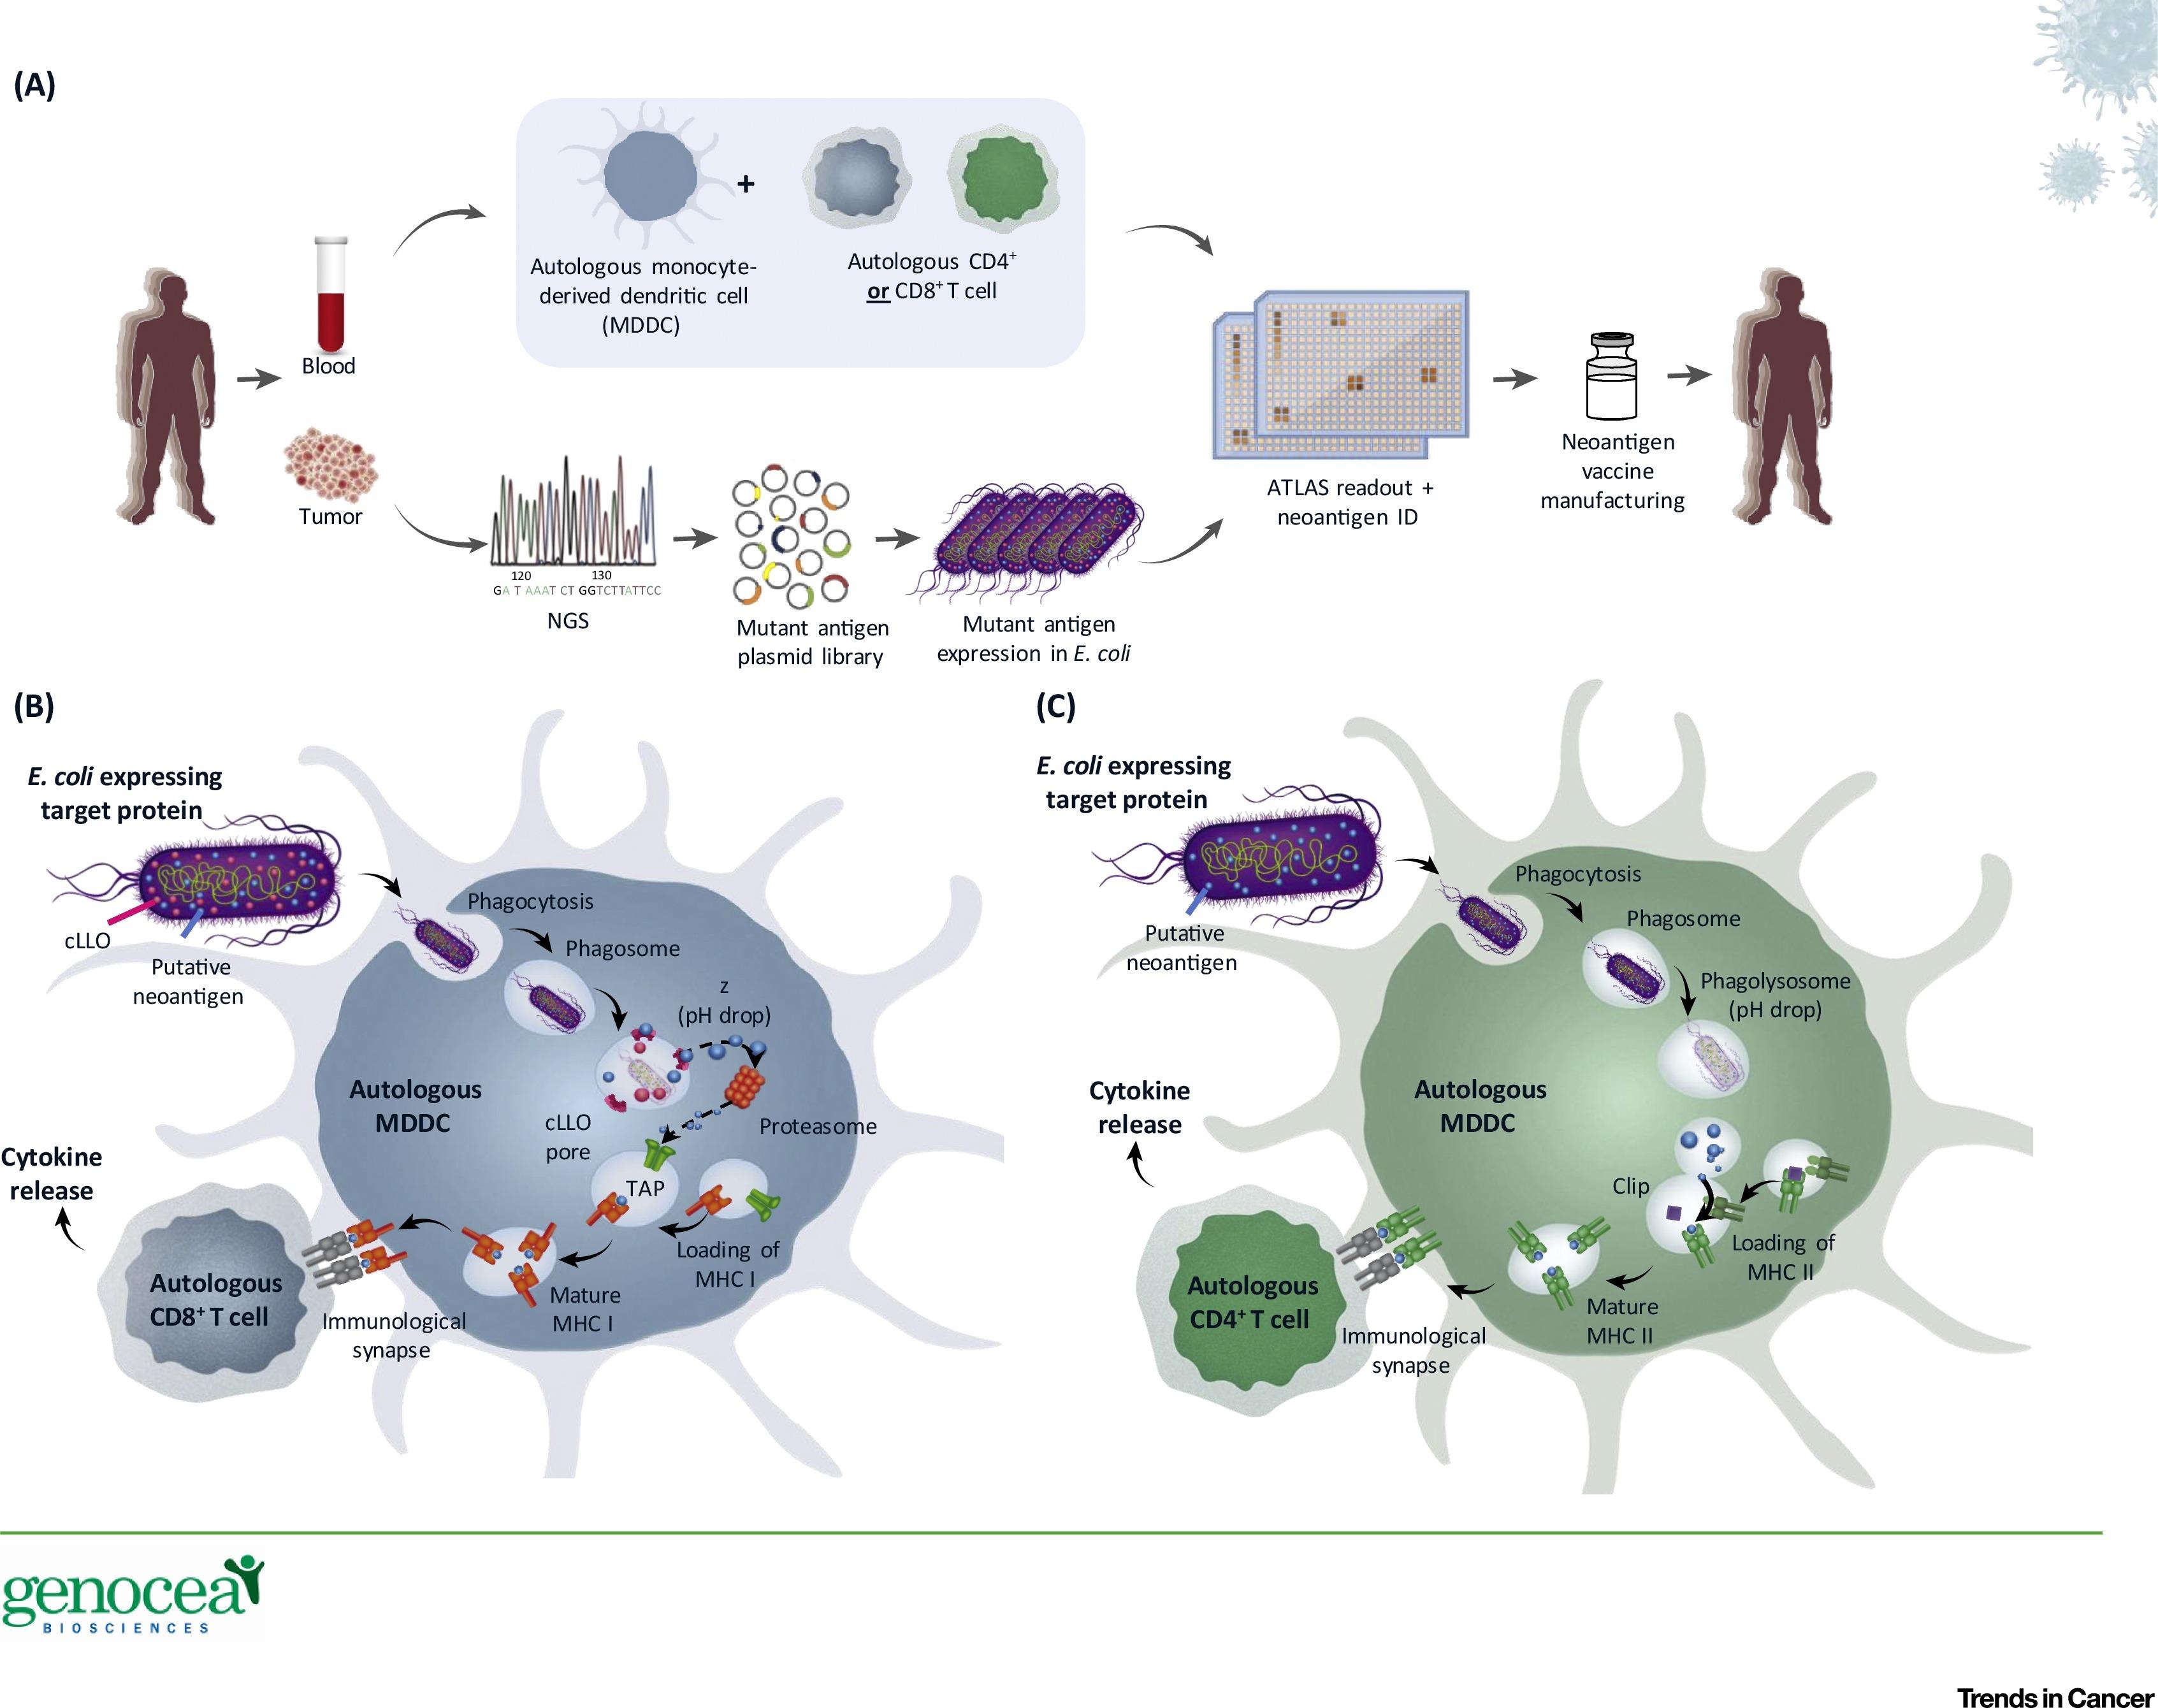 Improving Cancer Immunotherapies Through Empirical